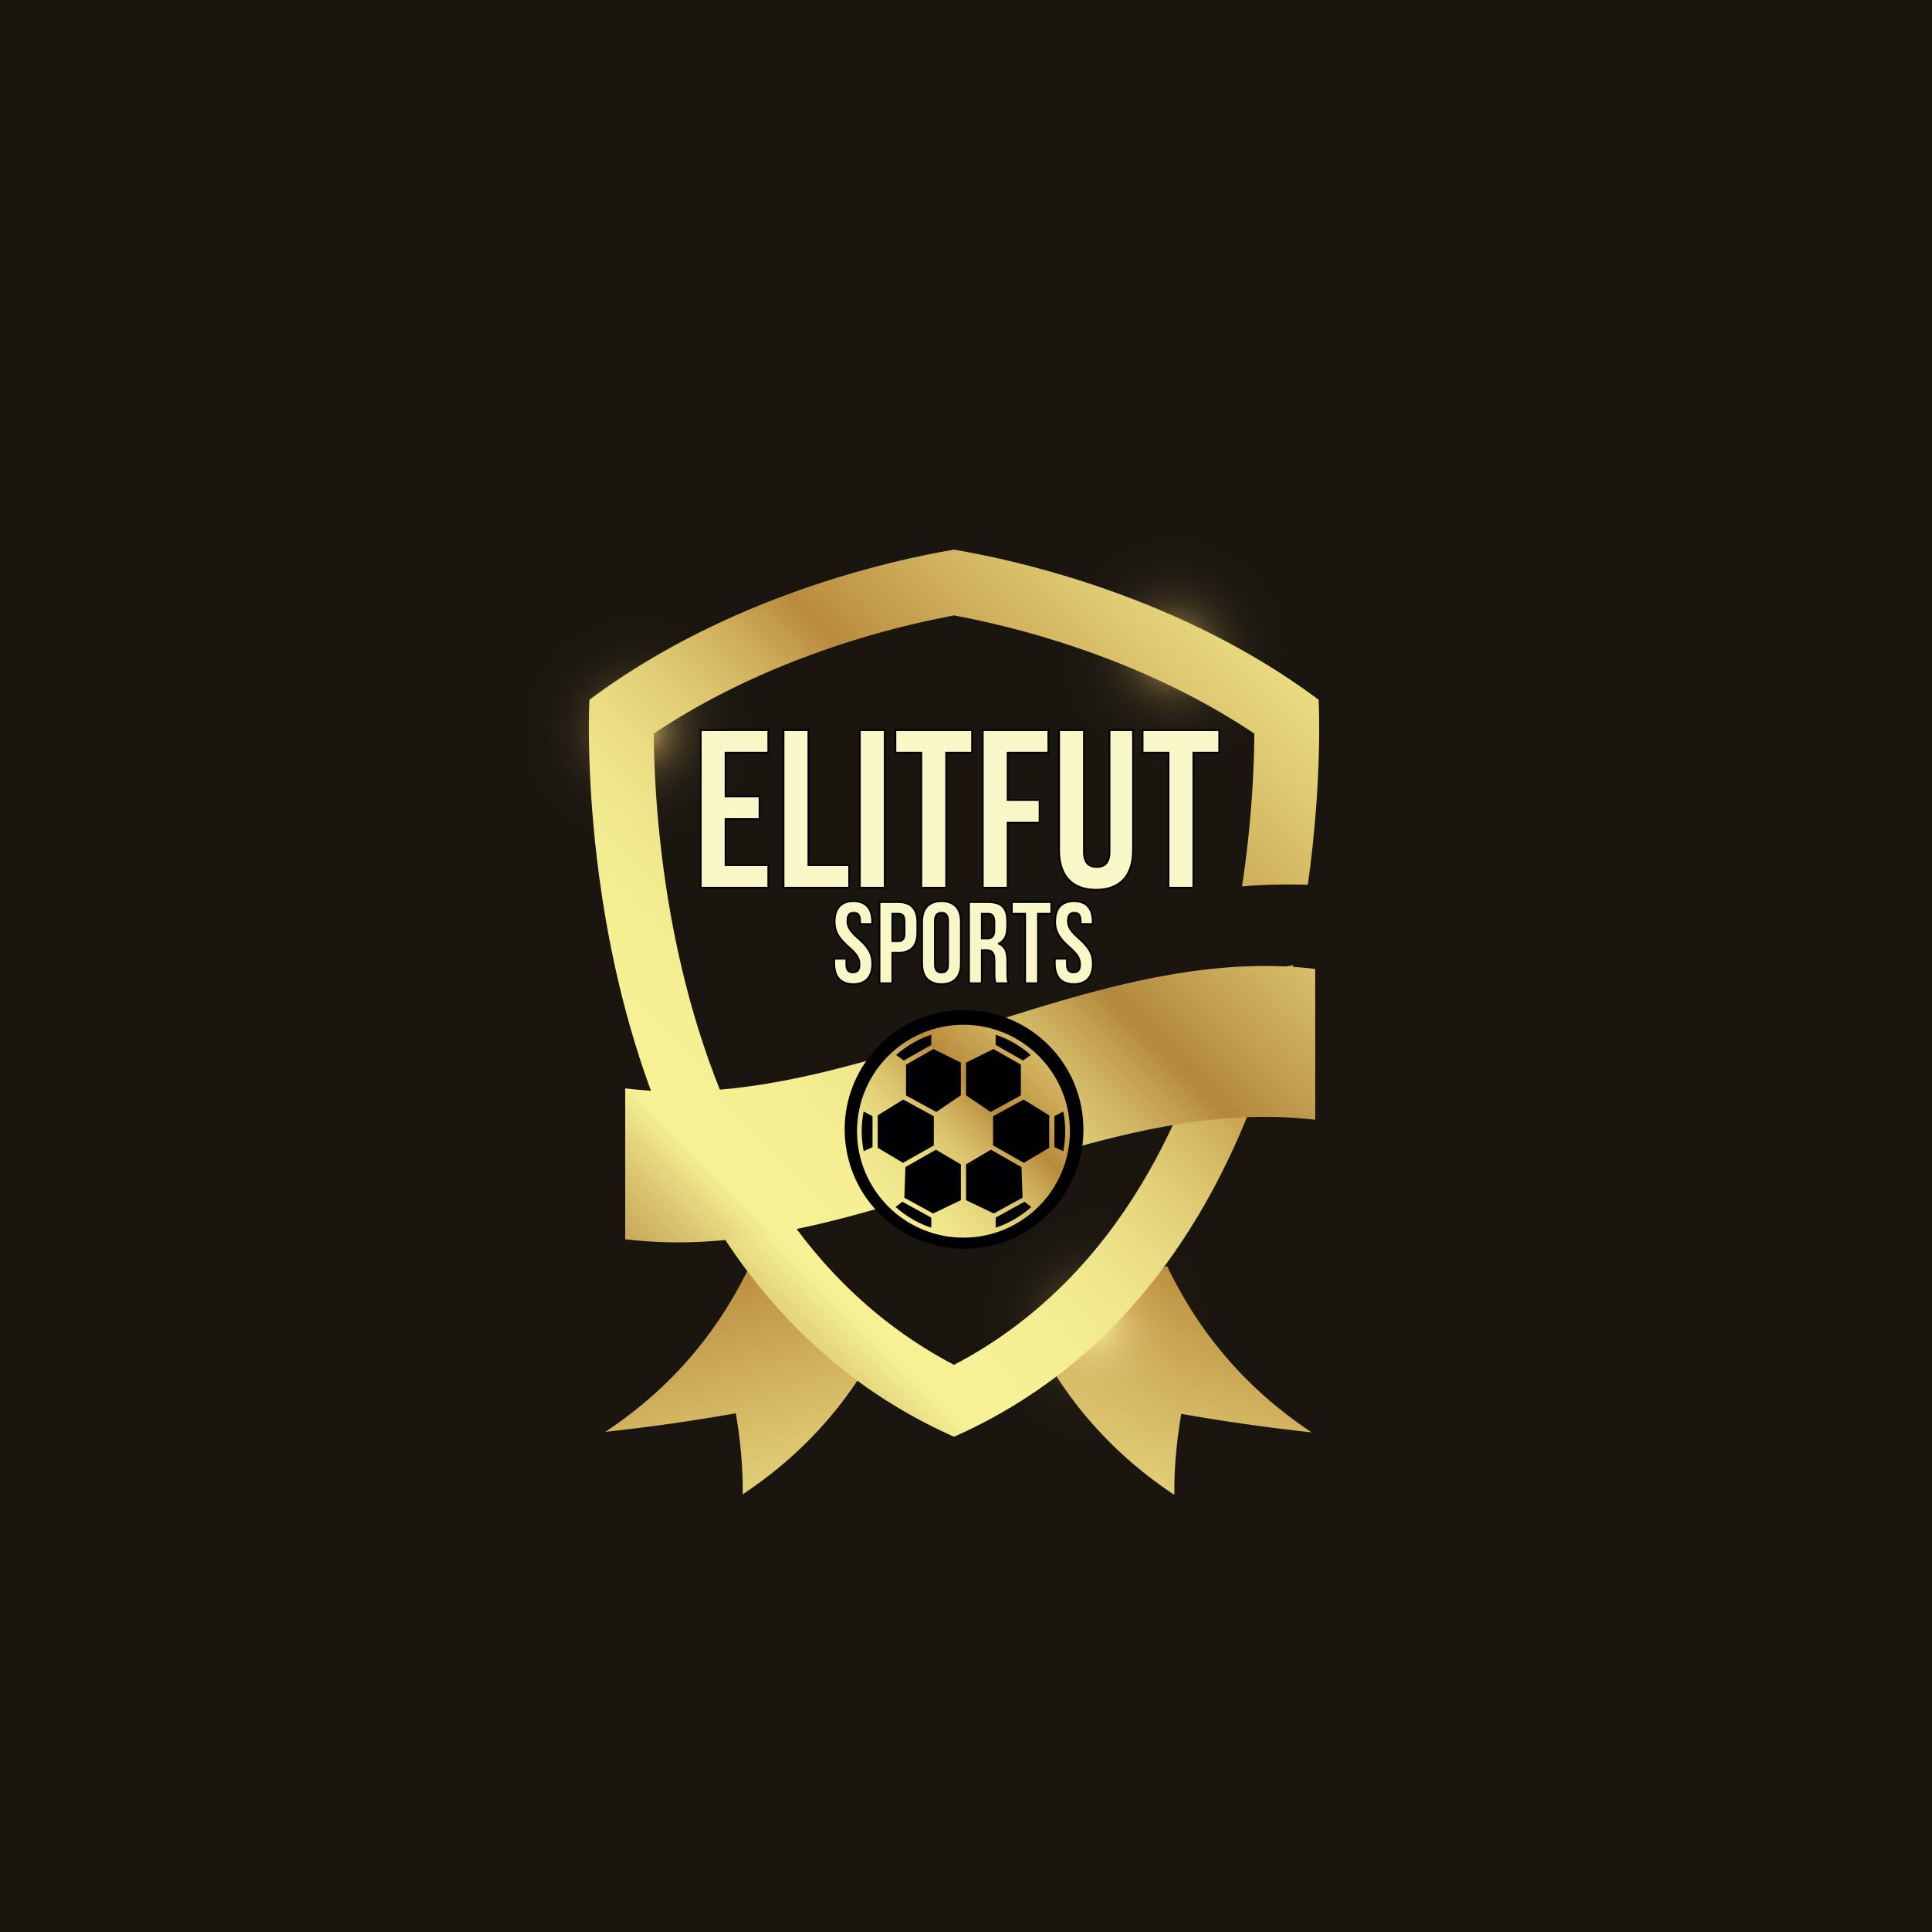 Elitfut Sports